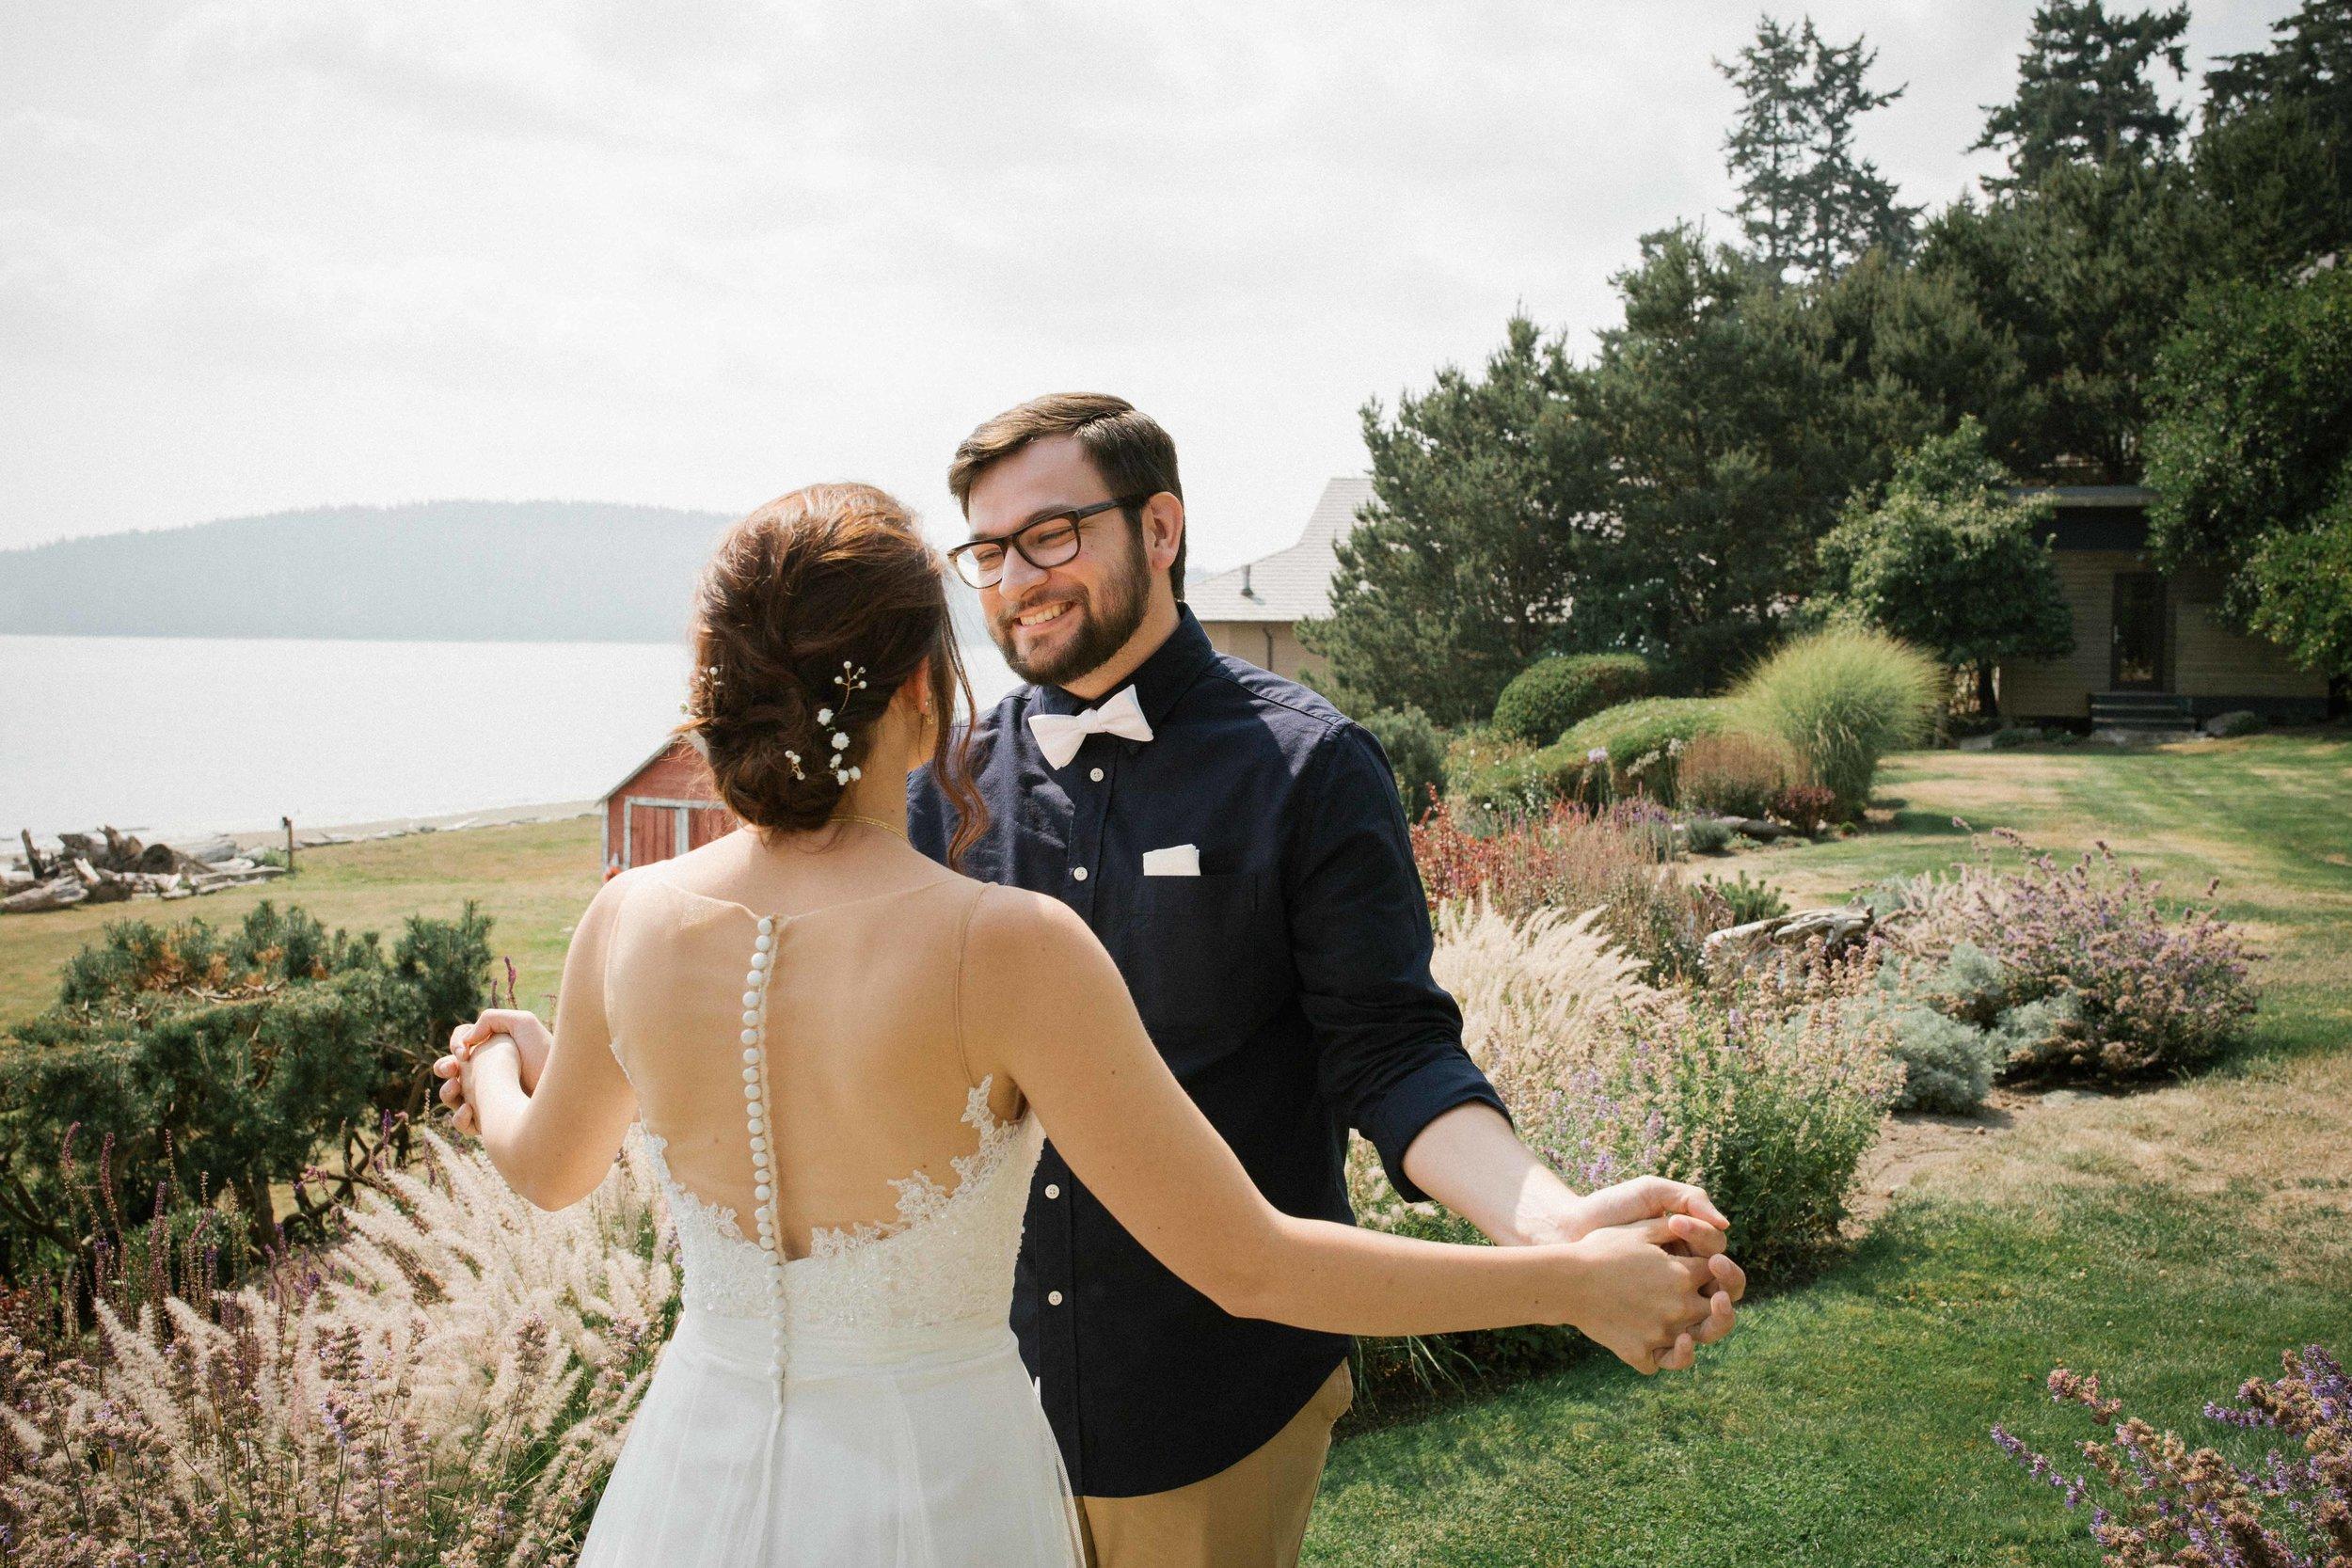 deception-pass-wedding-18.jpg